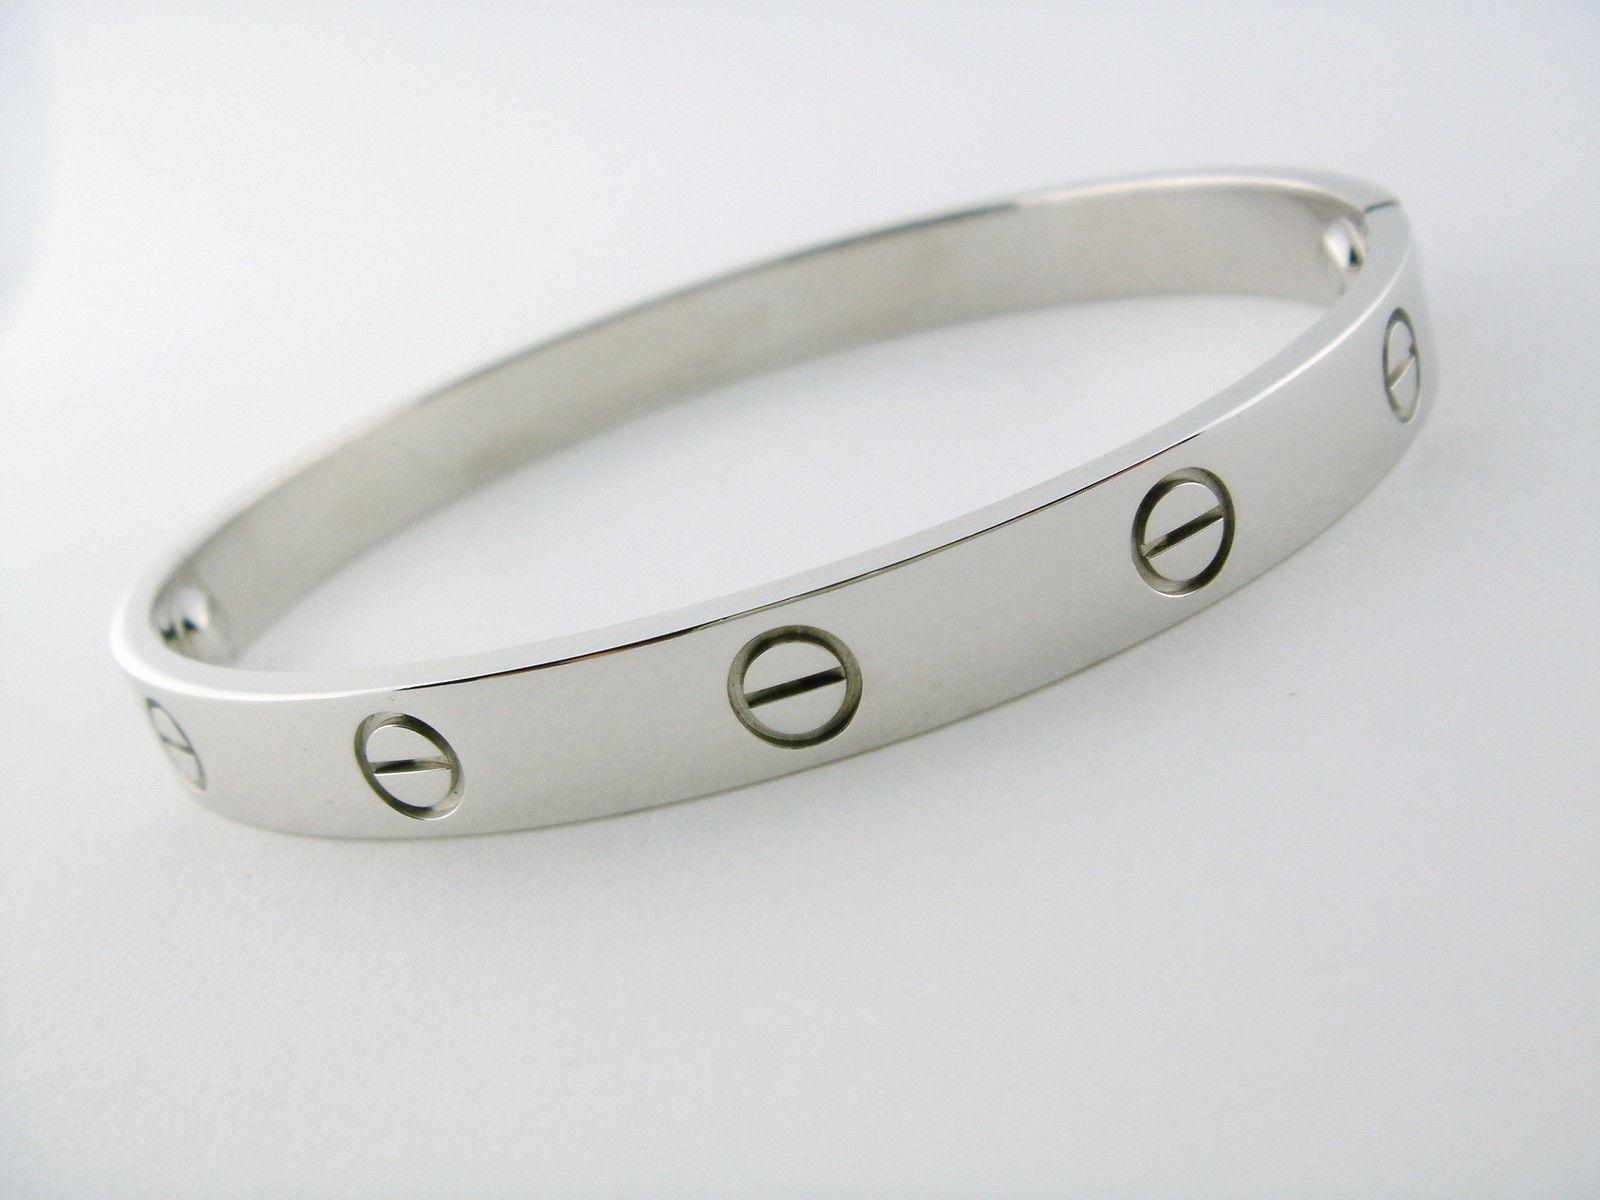 0352fa1742e23 Cartier Love Bracelet Bangle 18K White Gold and 20 similar items